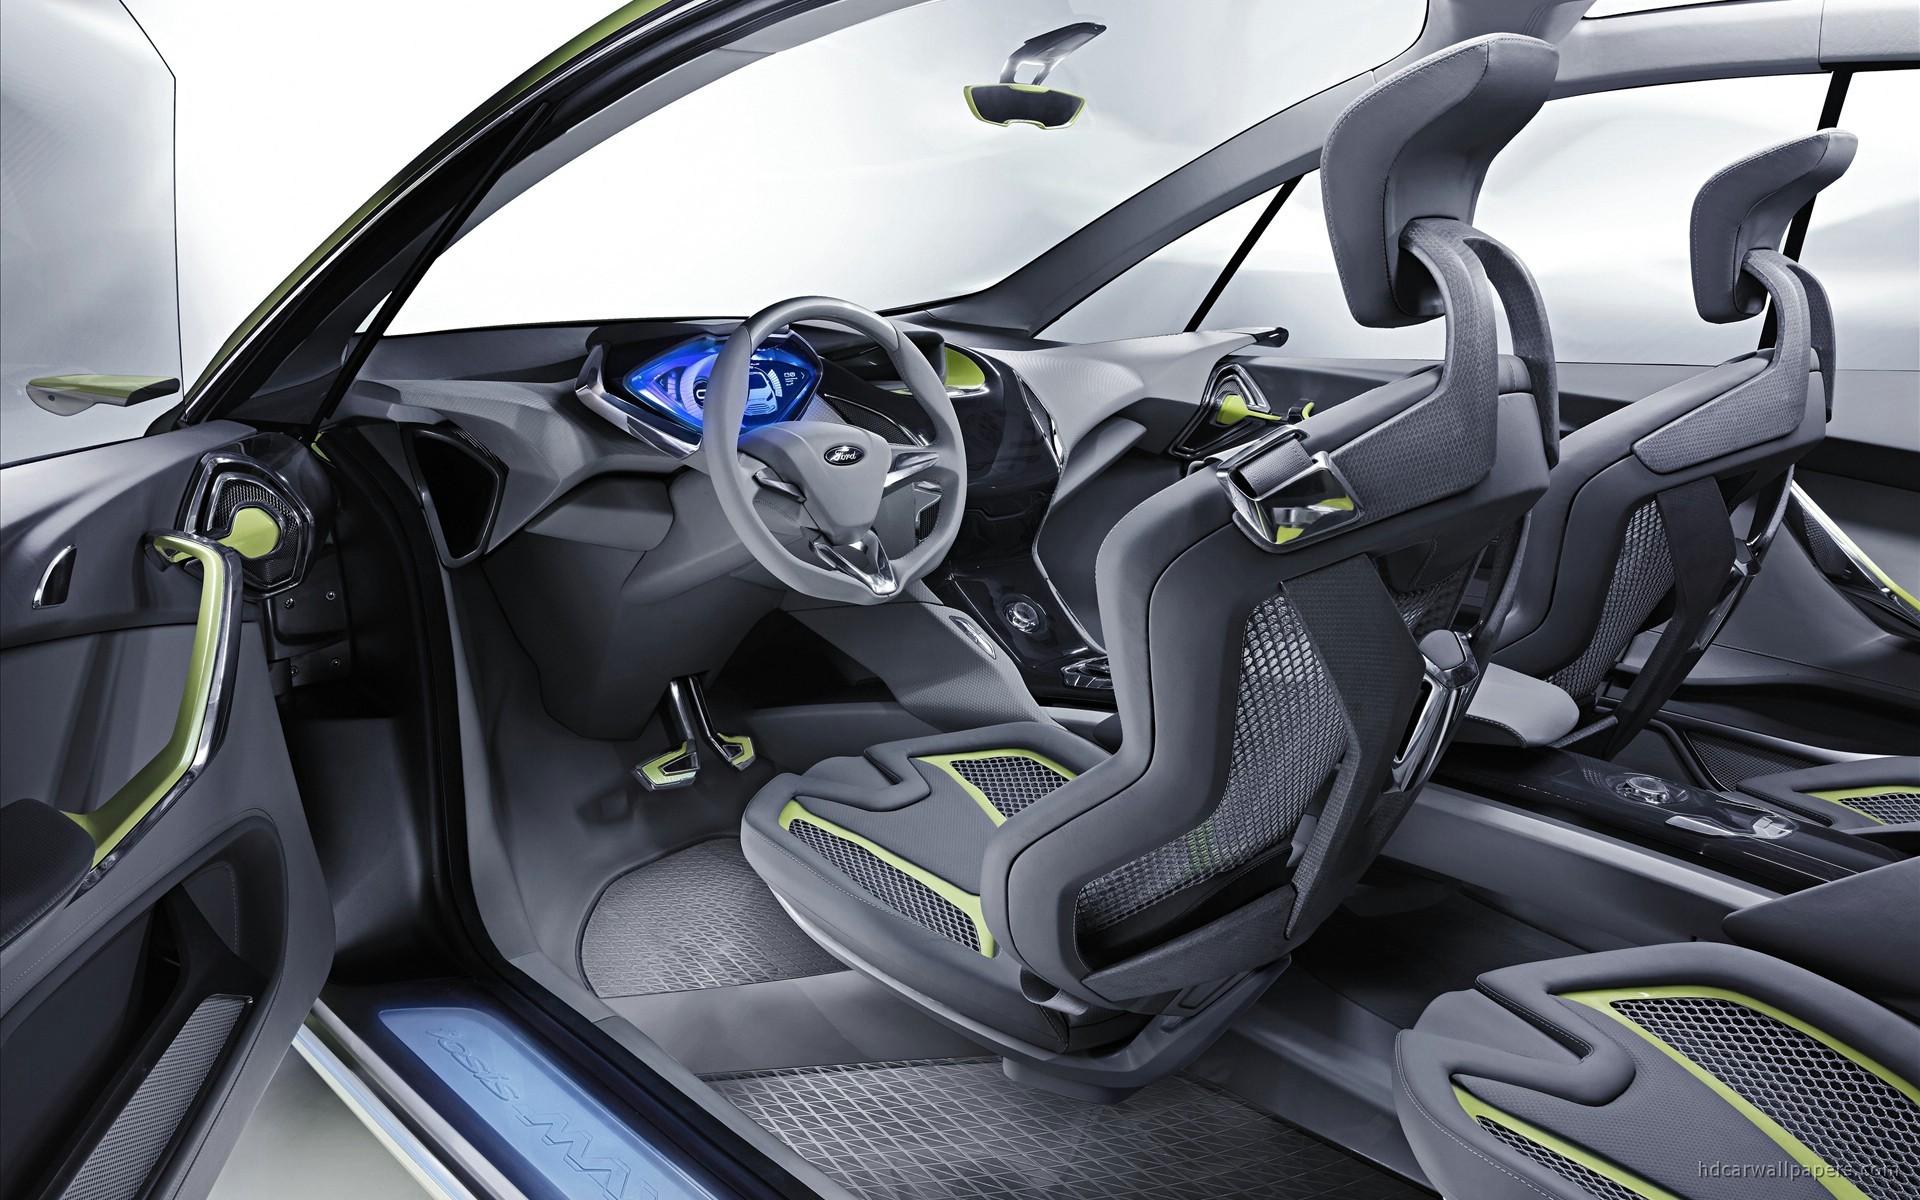 2009 Ford Iosis Max Concept Interior Wallpaper Hd Car